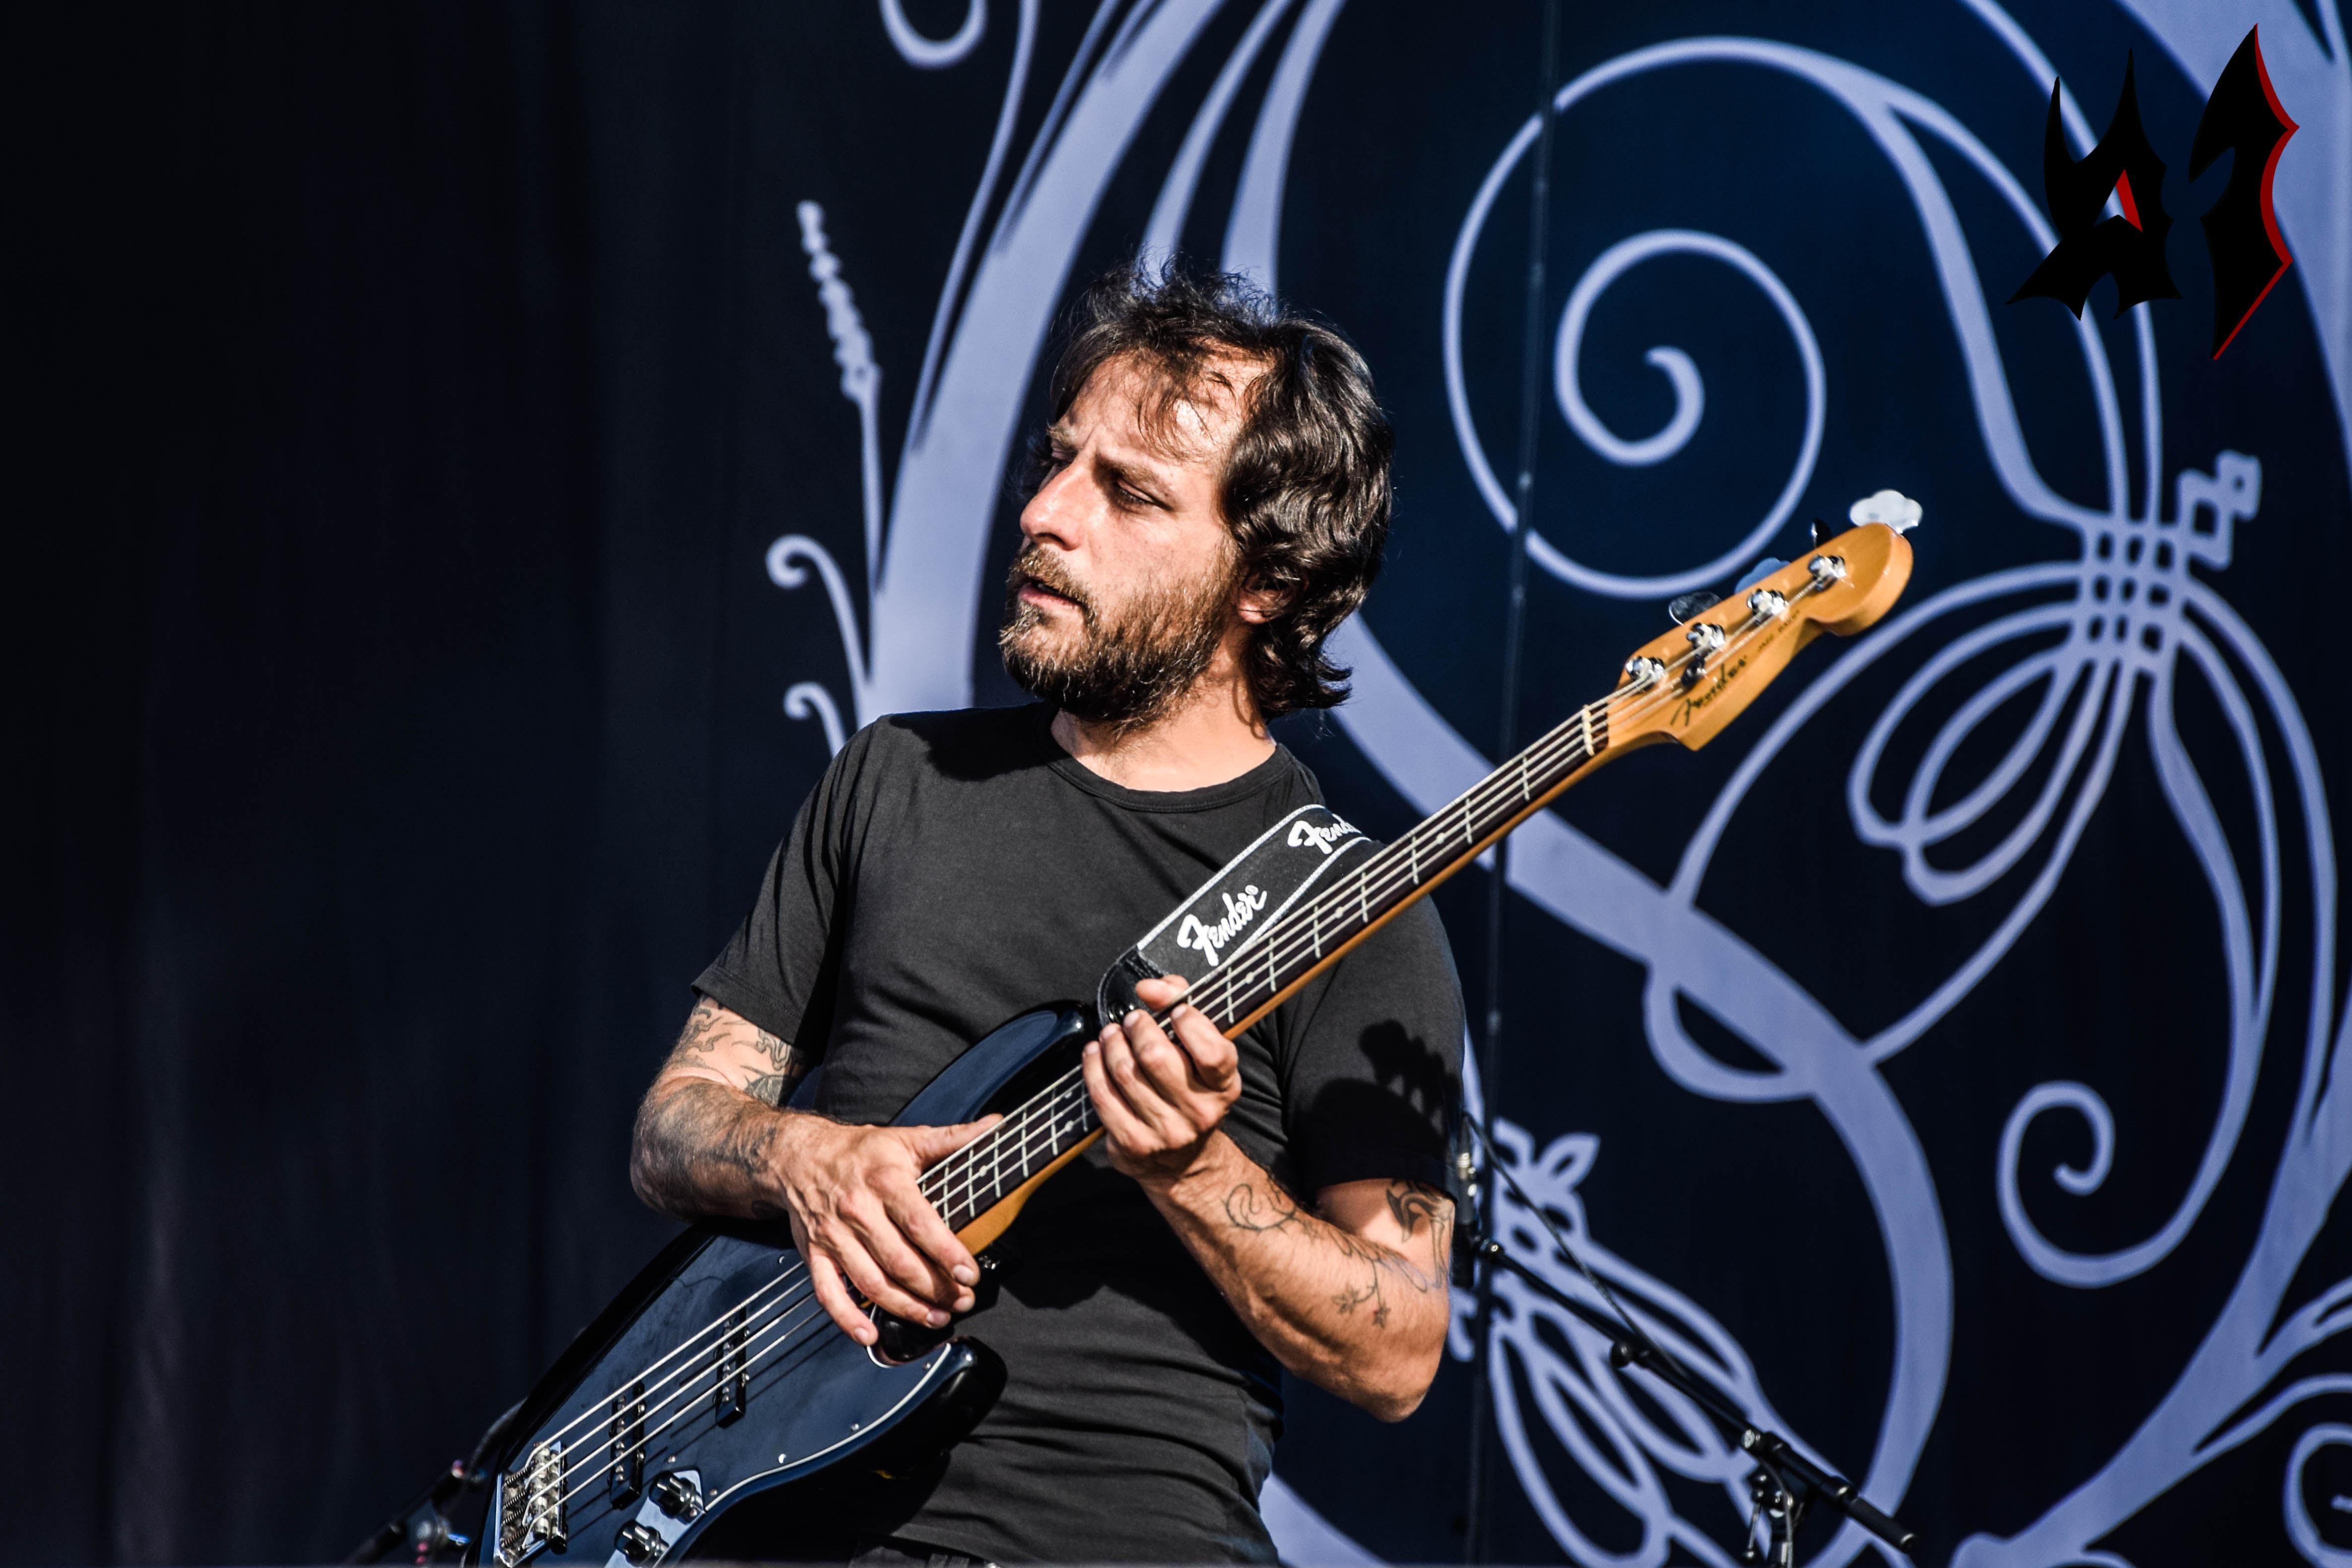 Donwload 2018 – Day 1 - Opeth 18